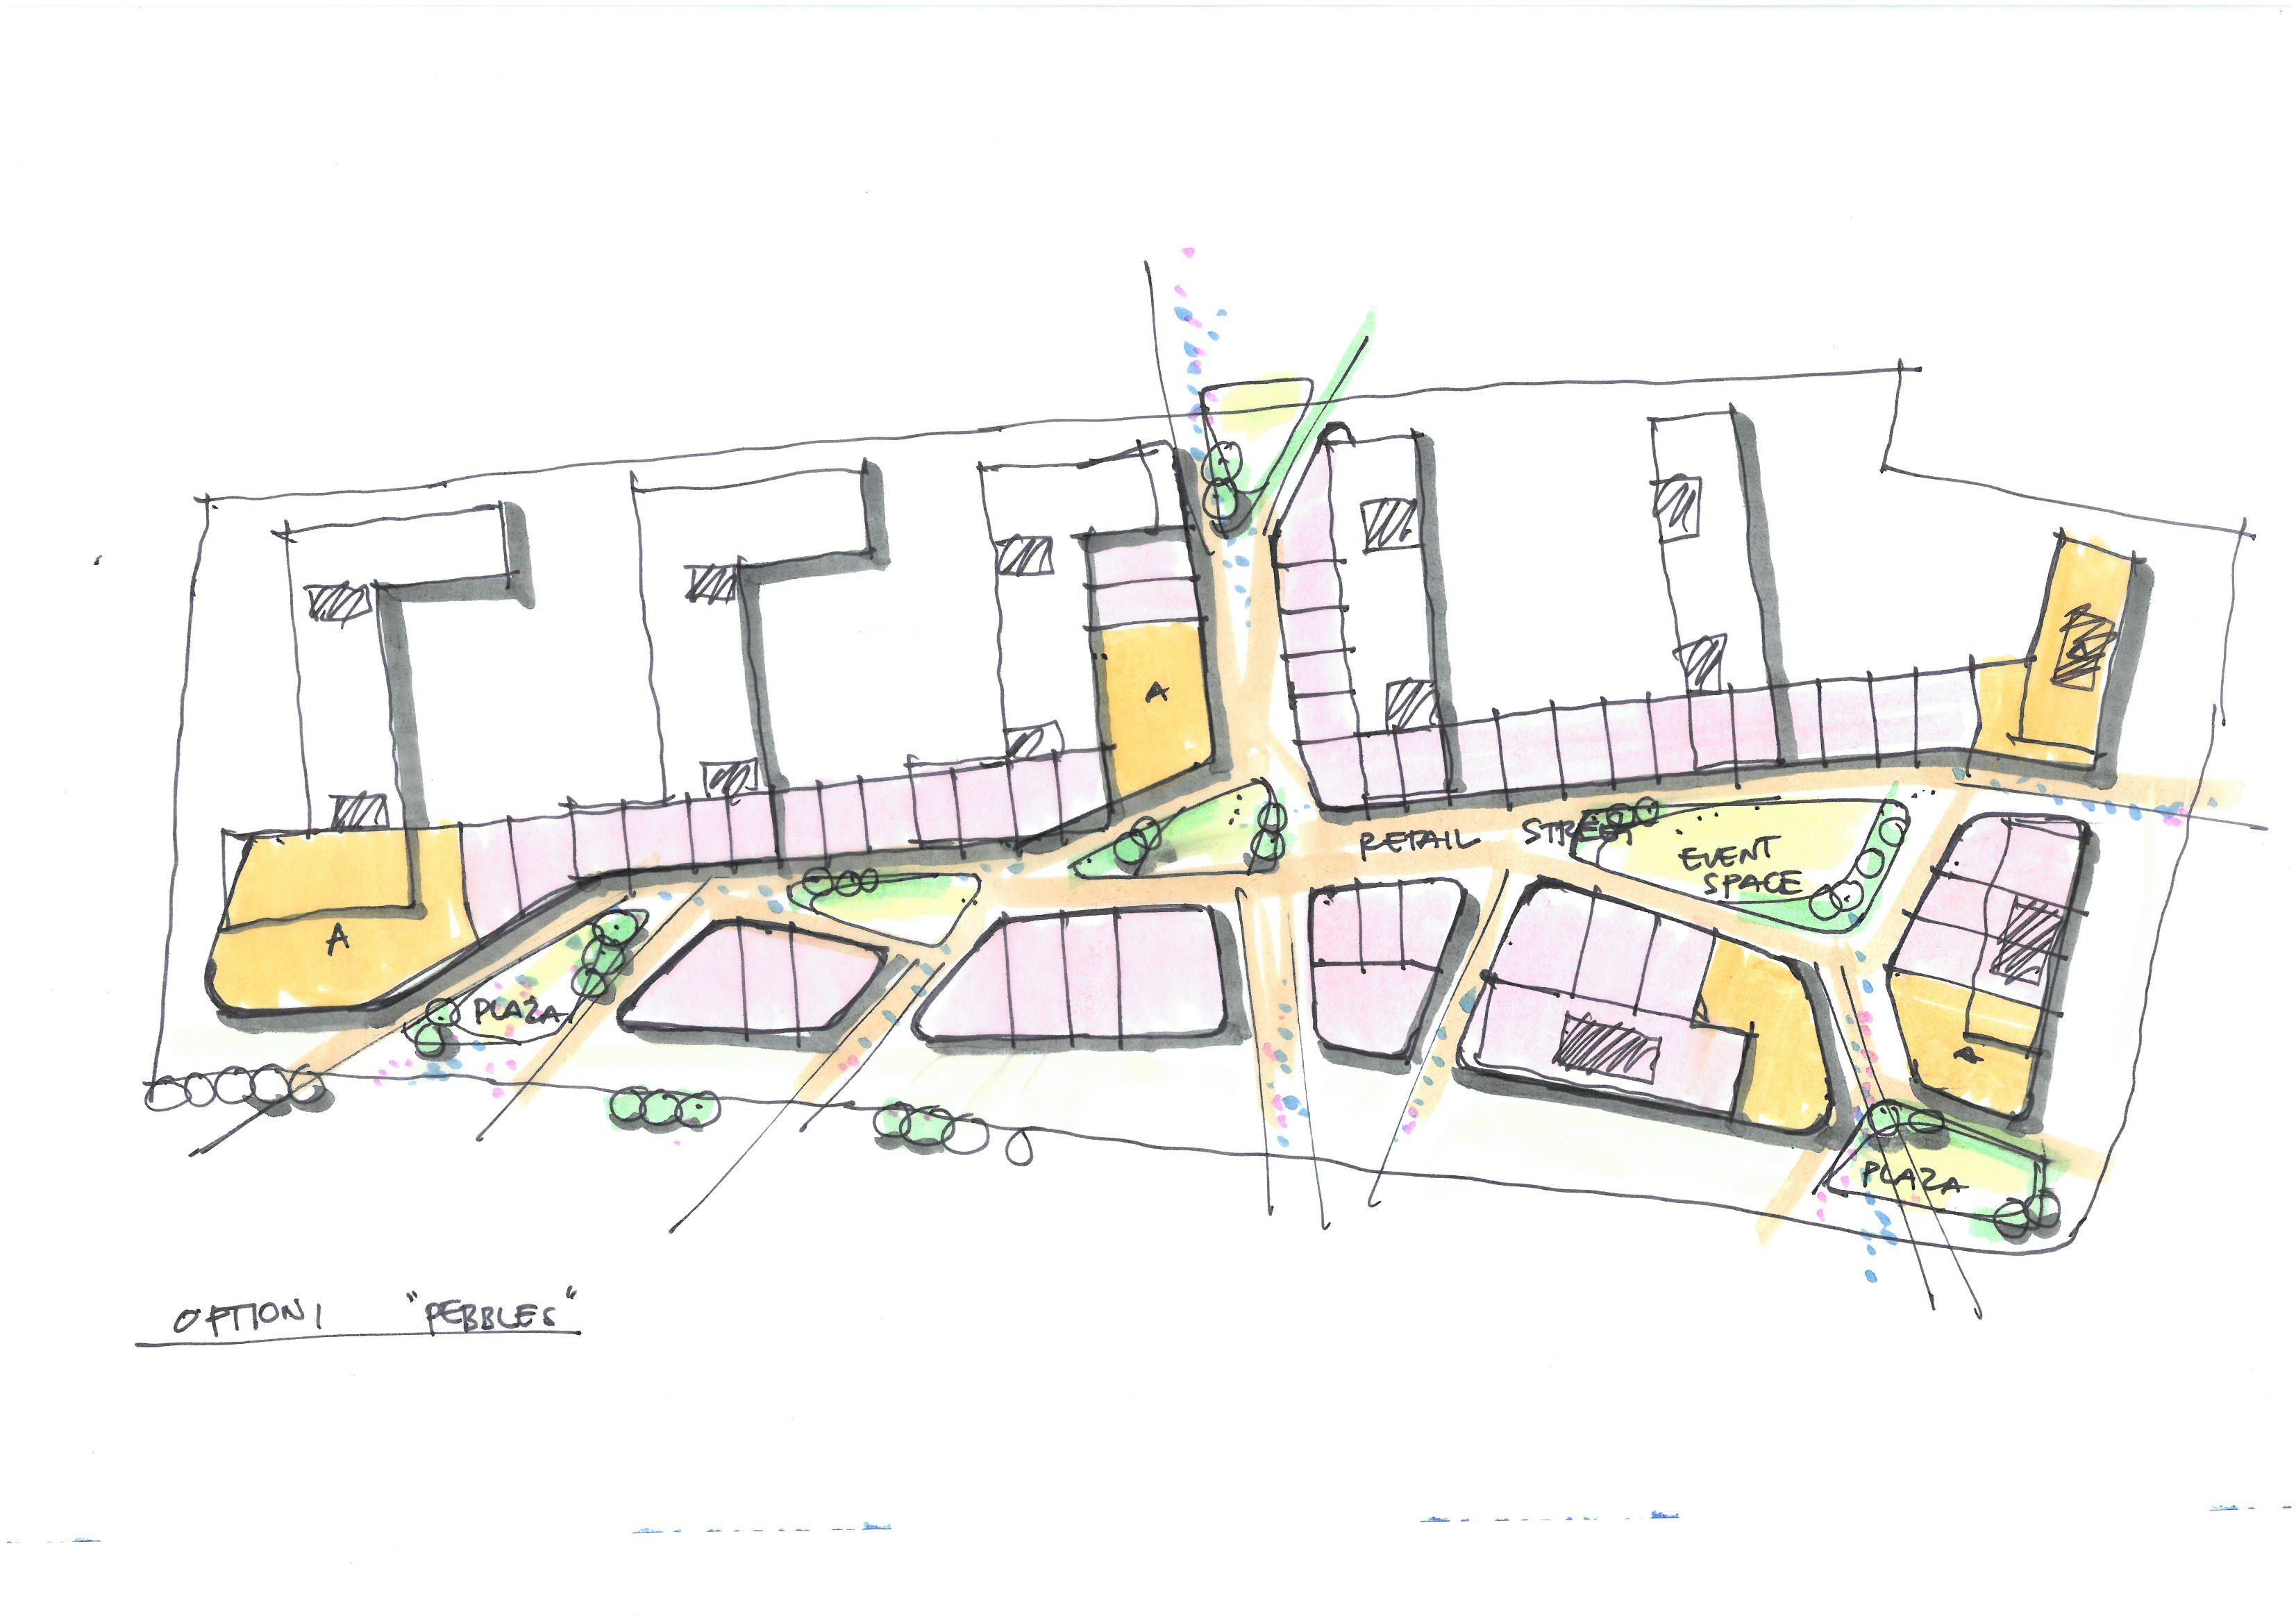 Plan Concept retail plan concept i randy carizo architecture sketches l randy